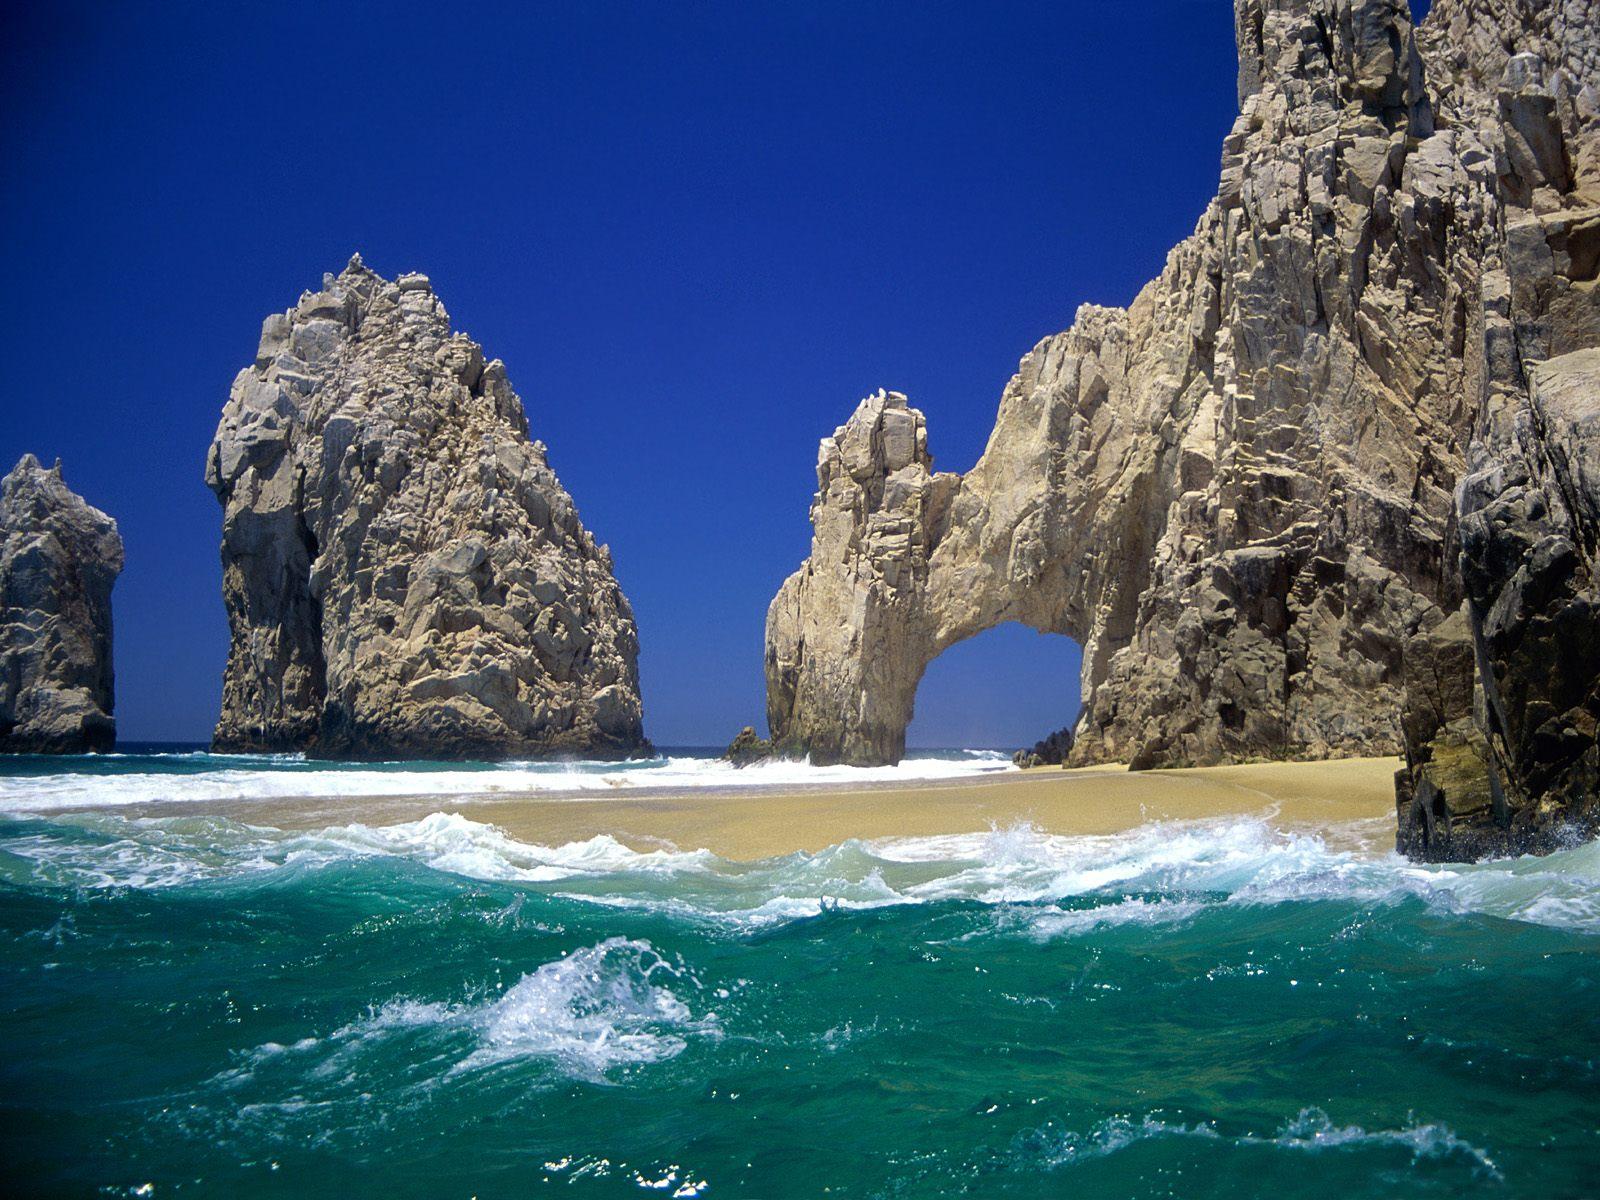 http://3.bp.blogspot.com/-OcX1zBoBtWU/TphGW87SwkI/AAAAAAAACIc/fcRch-NSzow/s1600/beautiful_3dwallpapers_Cabo_San_Lucas%252C_Mexico_-_El_Arco.jpg